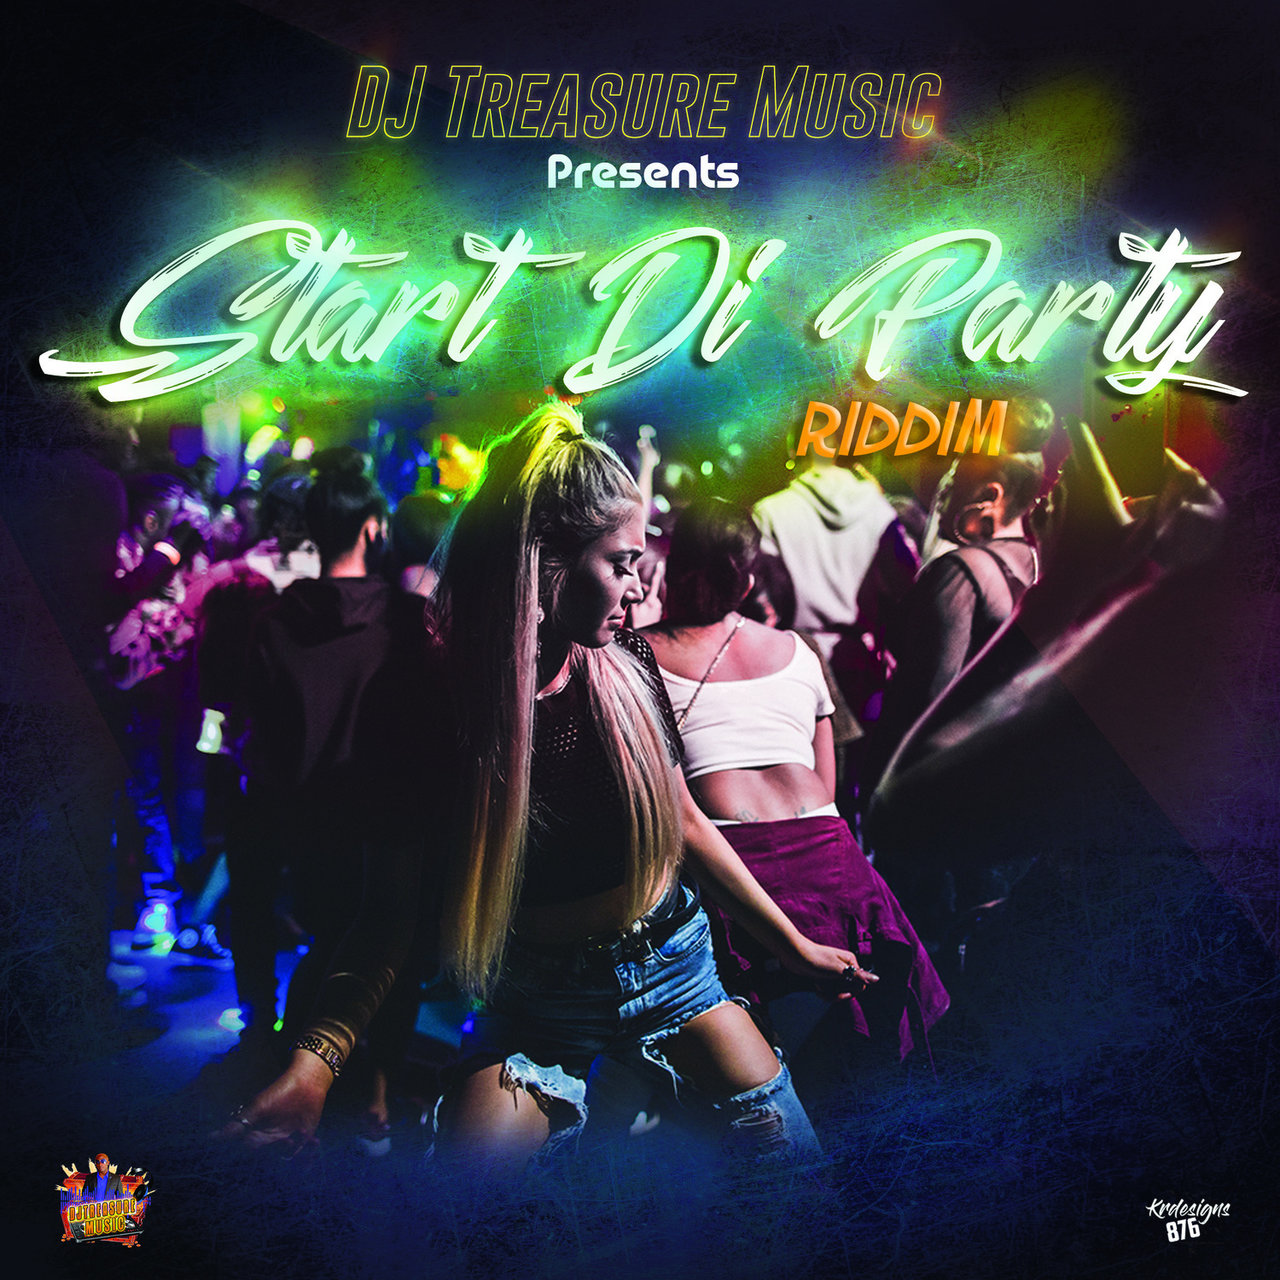 Start Di Party Riddim (Cover)